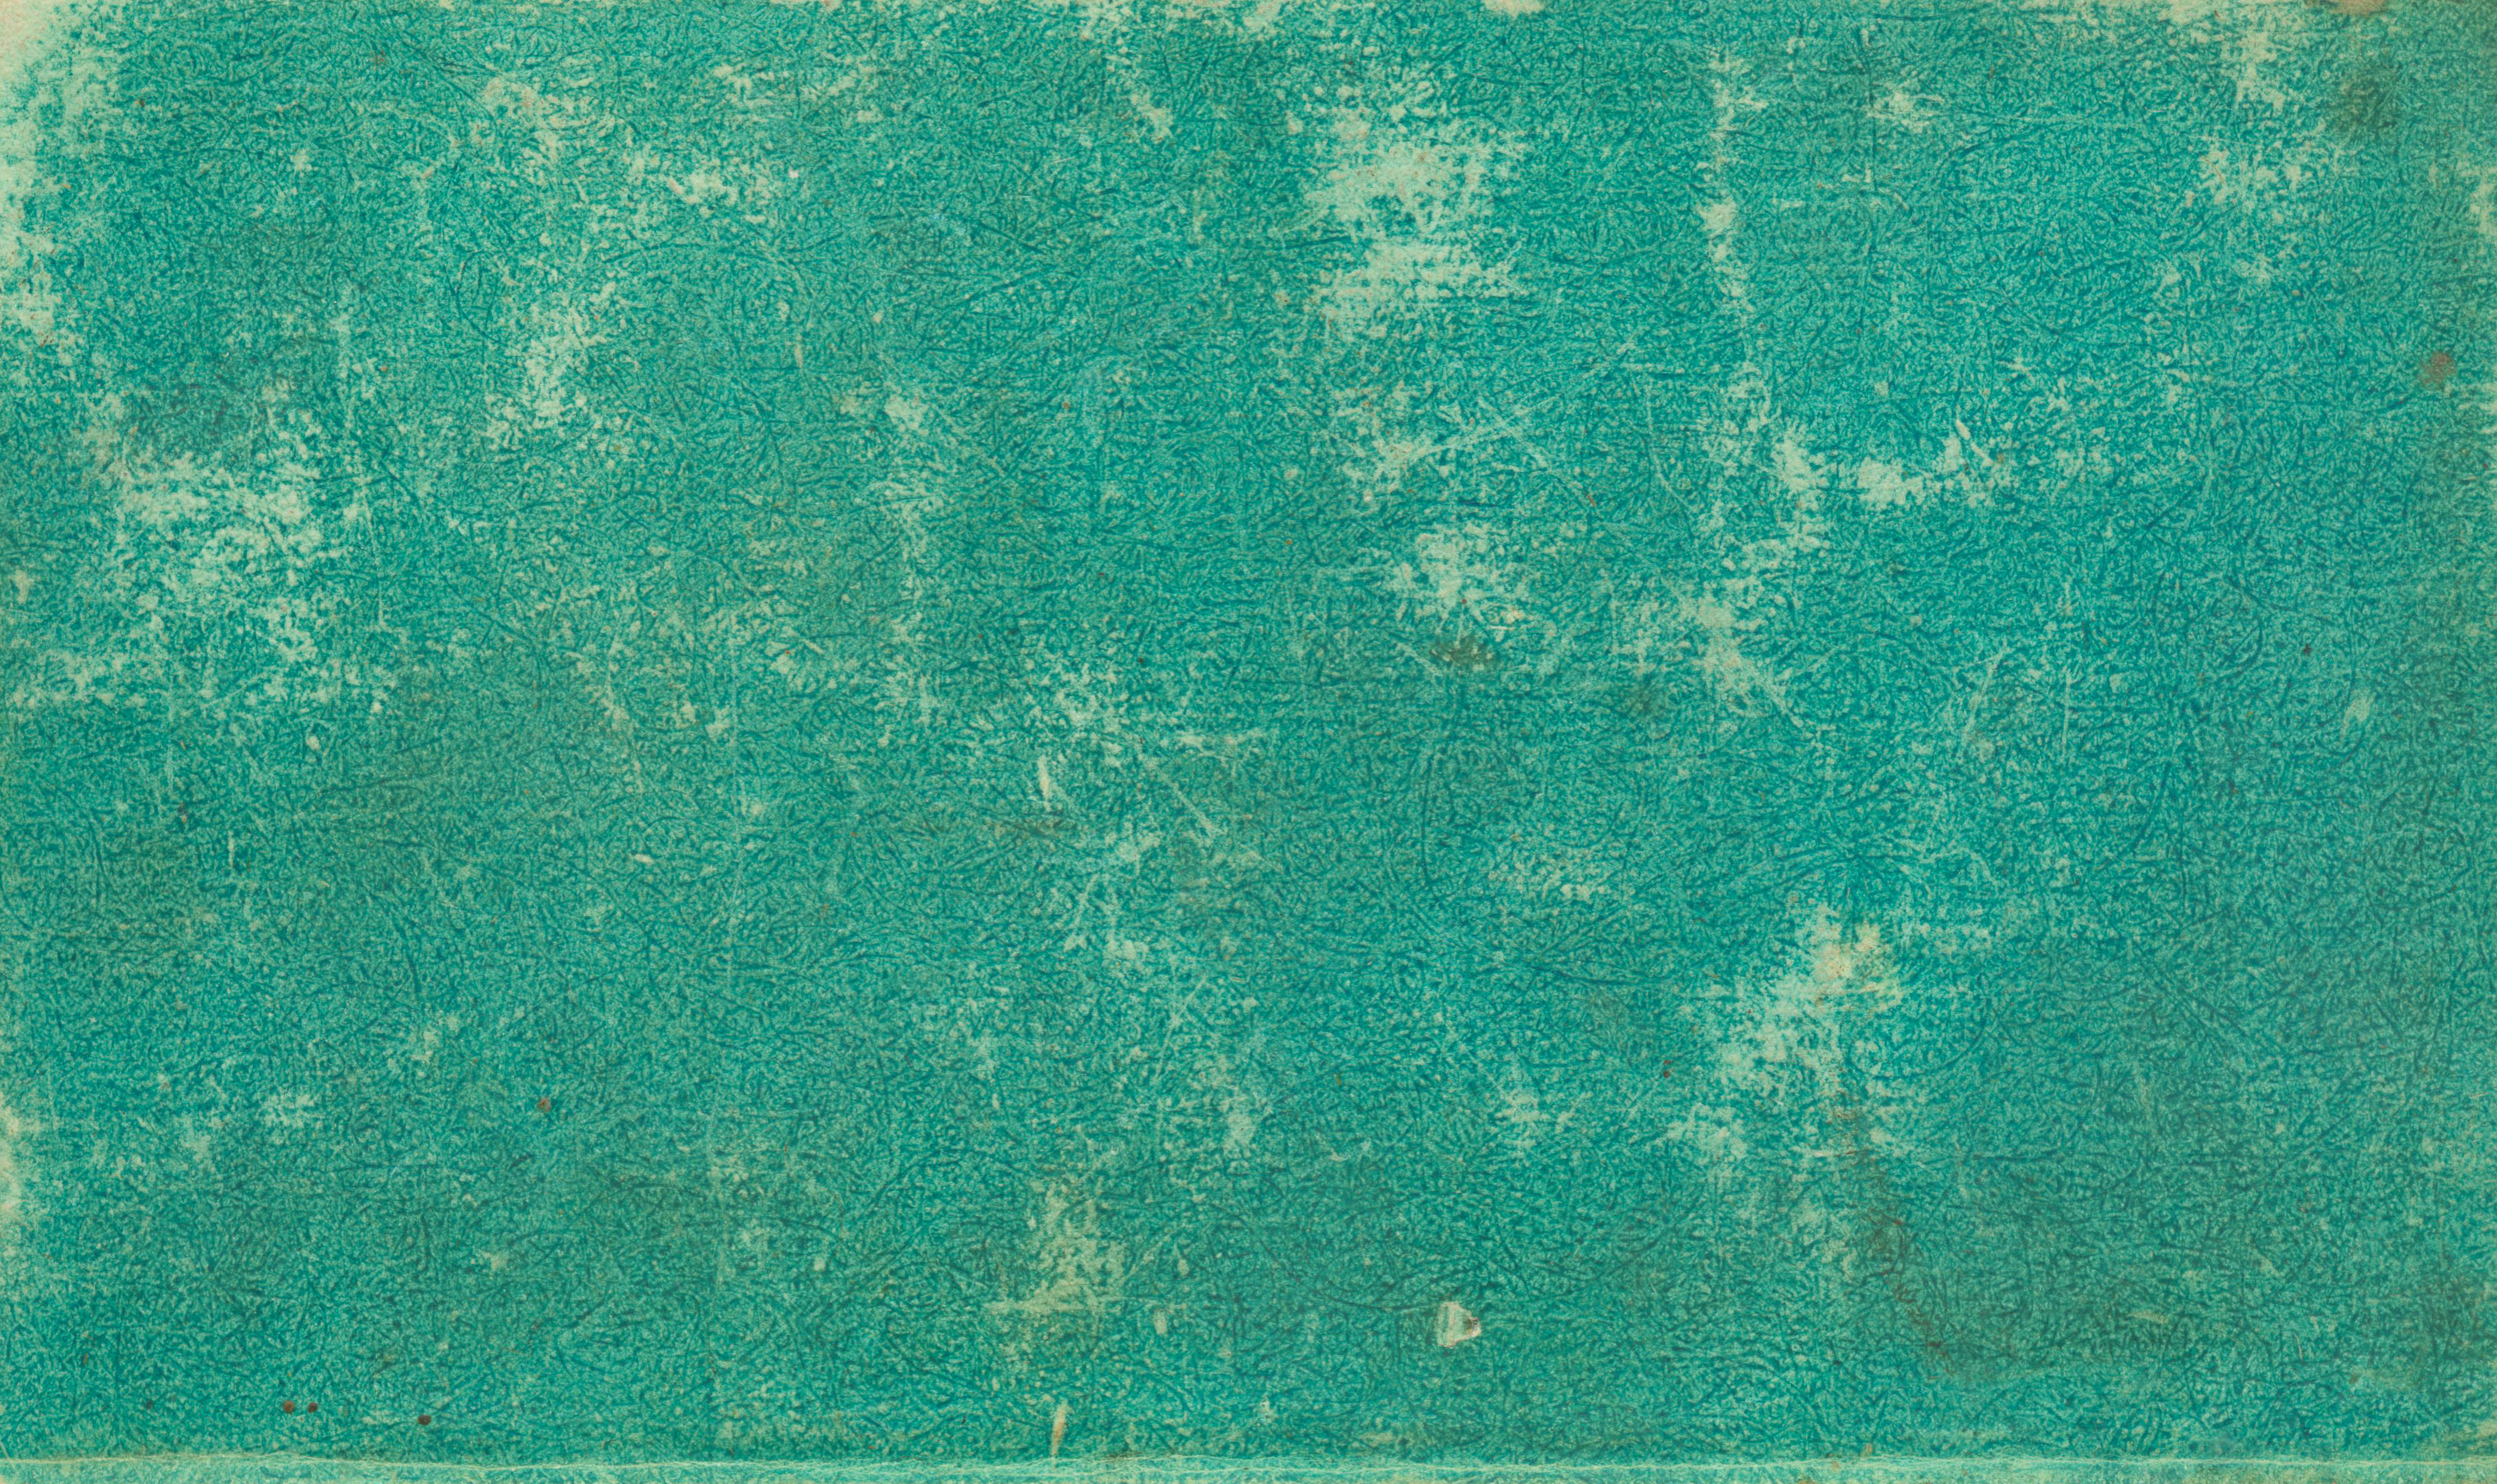 56 Hq Vintage Texture Texturepalace Com